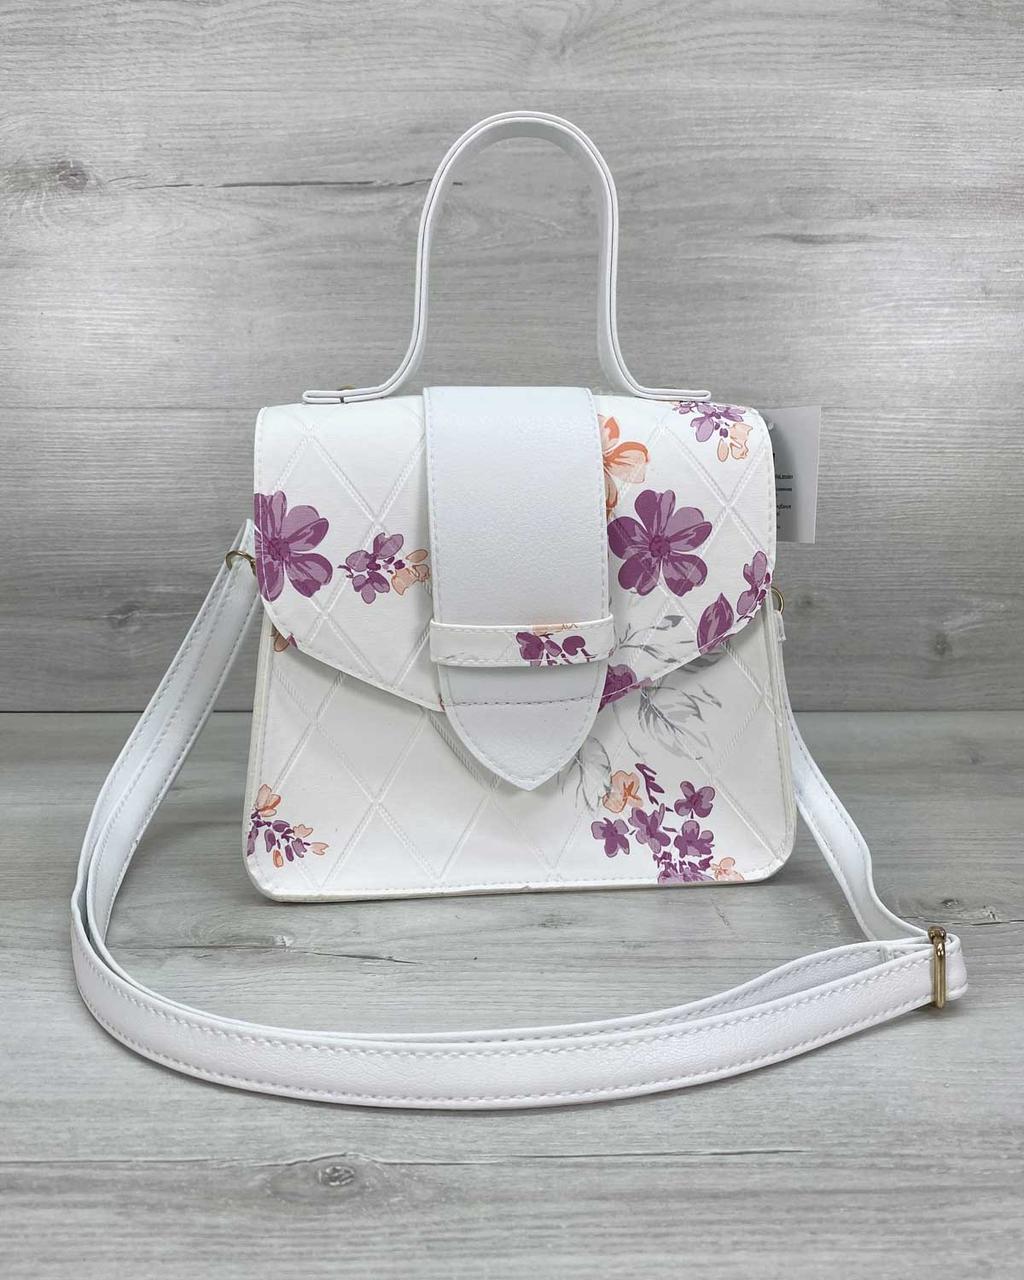 Женская летняя белая сумка каркасная на плечо